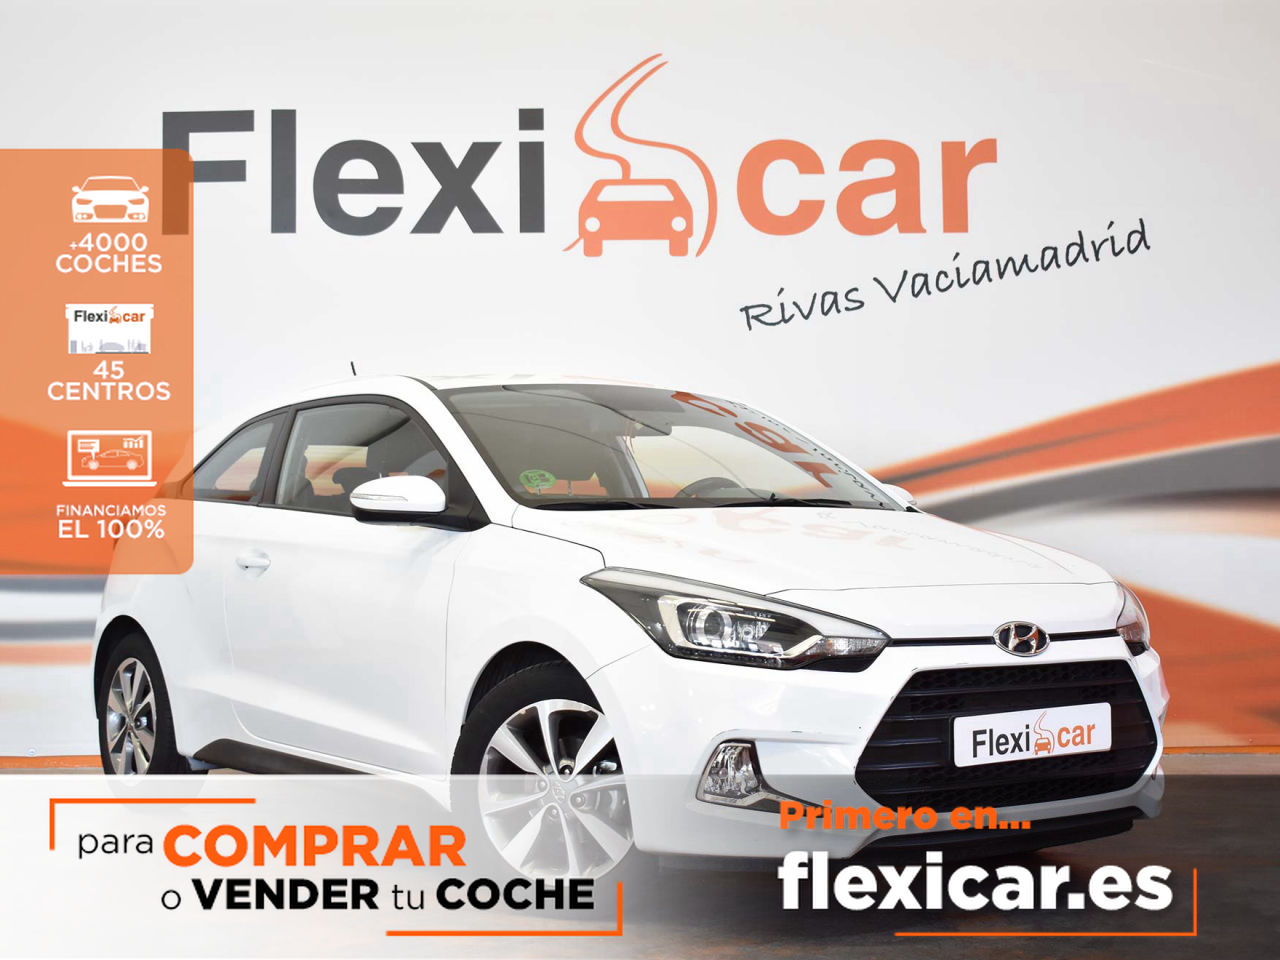 Hyundai i20 ocasión segunda mano 2015 Gasolina por 8.990€ en Huelva